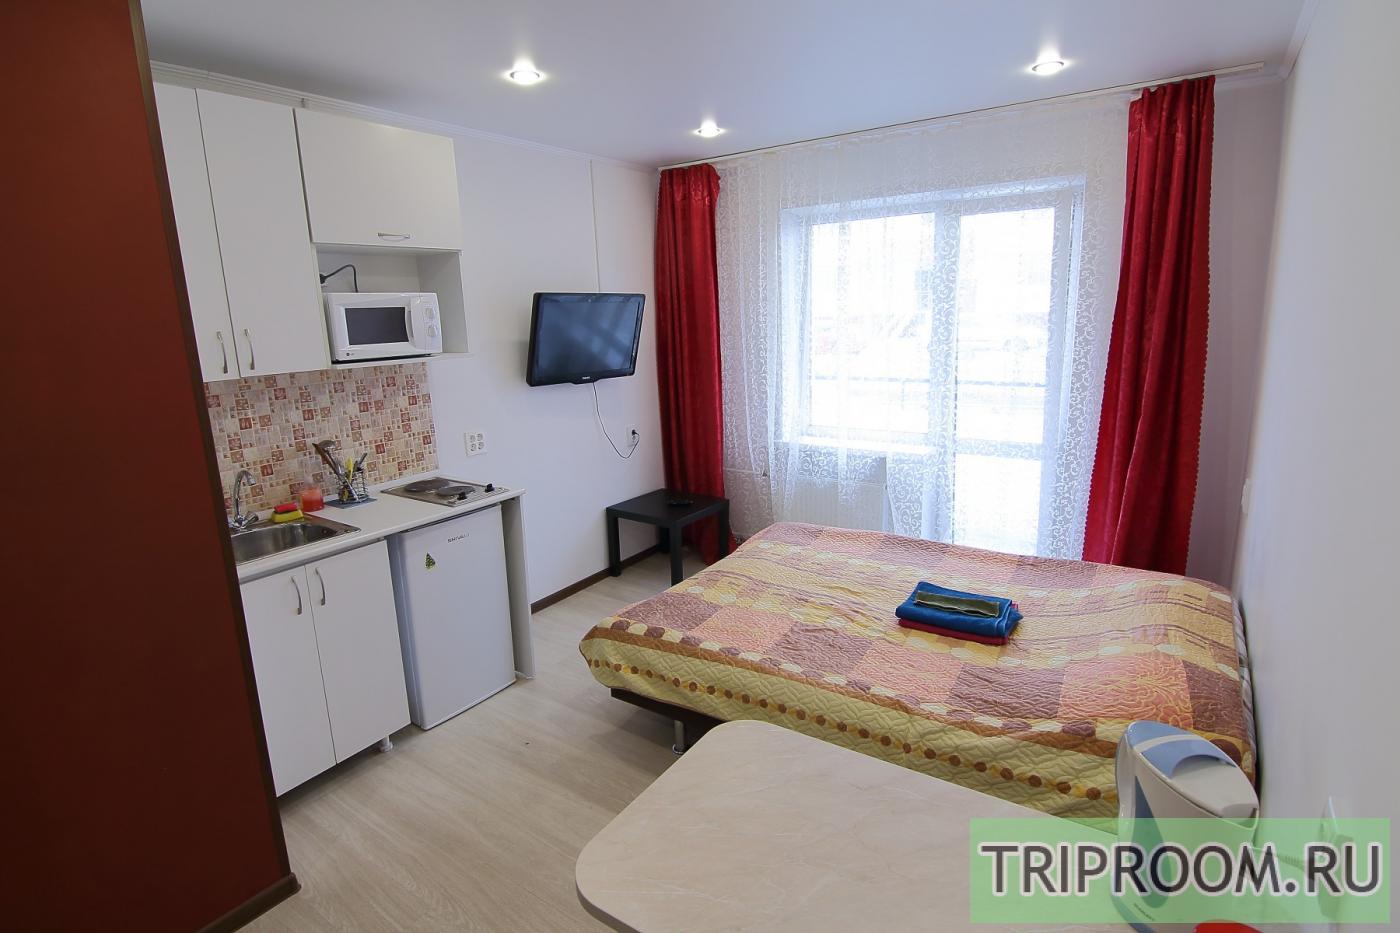 1-комнатная квартира посуточно (вариант № 10582), ул. Романа Брянского улица, фото № 2